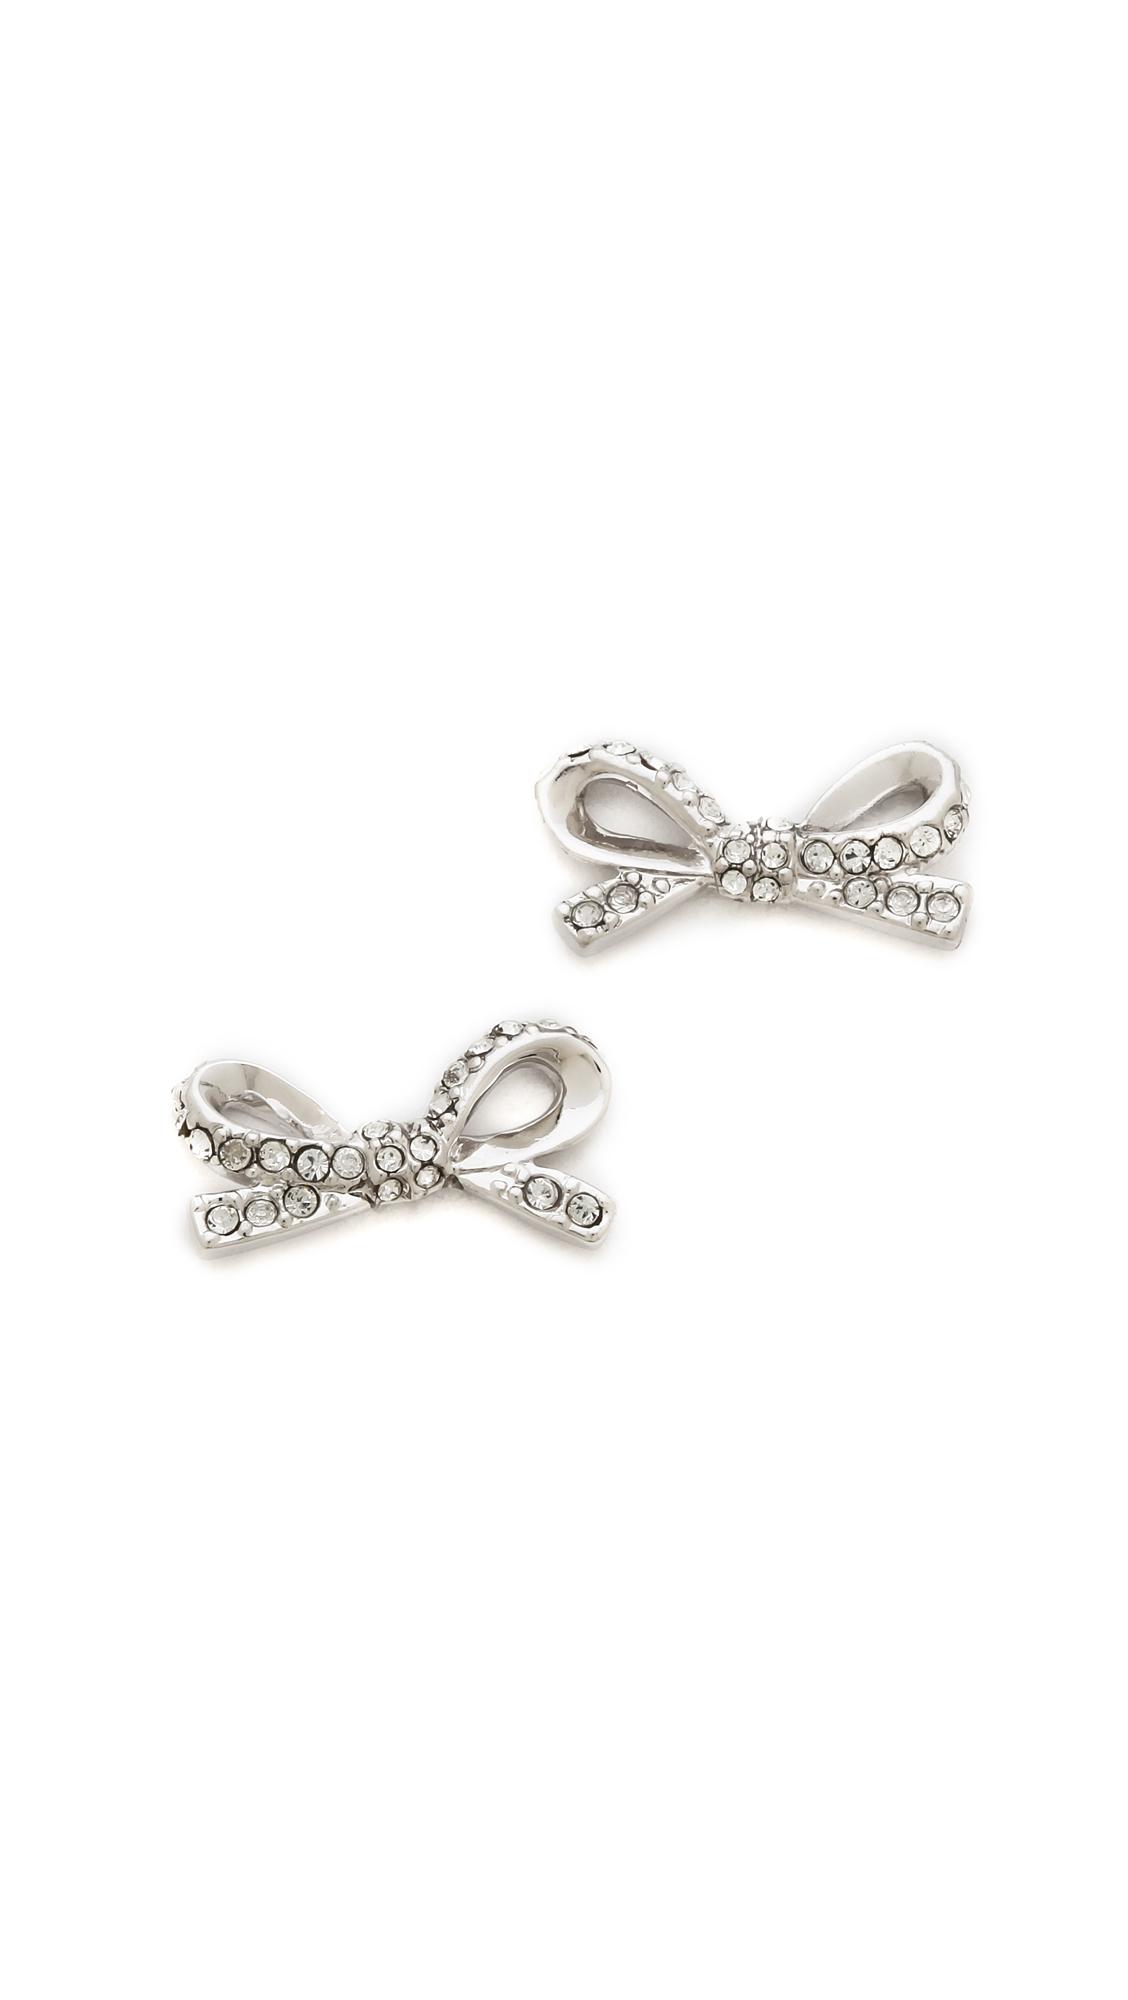 Kate Spade New York Skinny Mini Pave Bow Stud Earrings